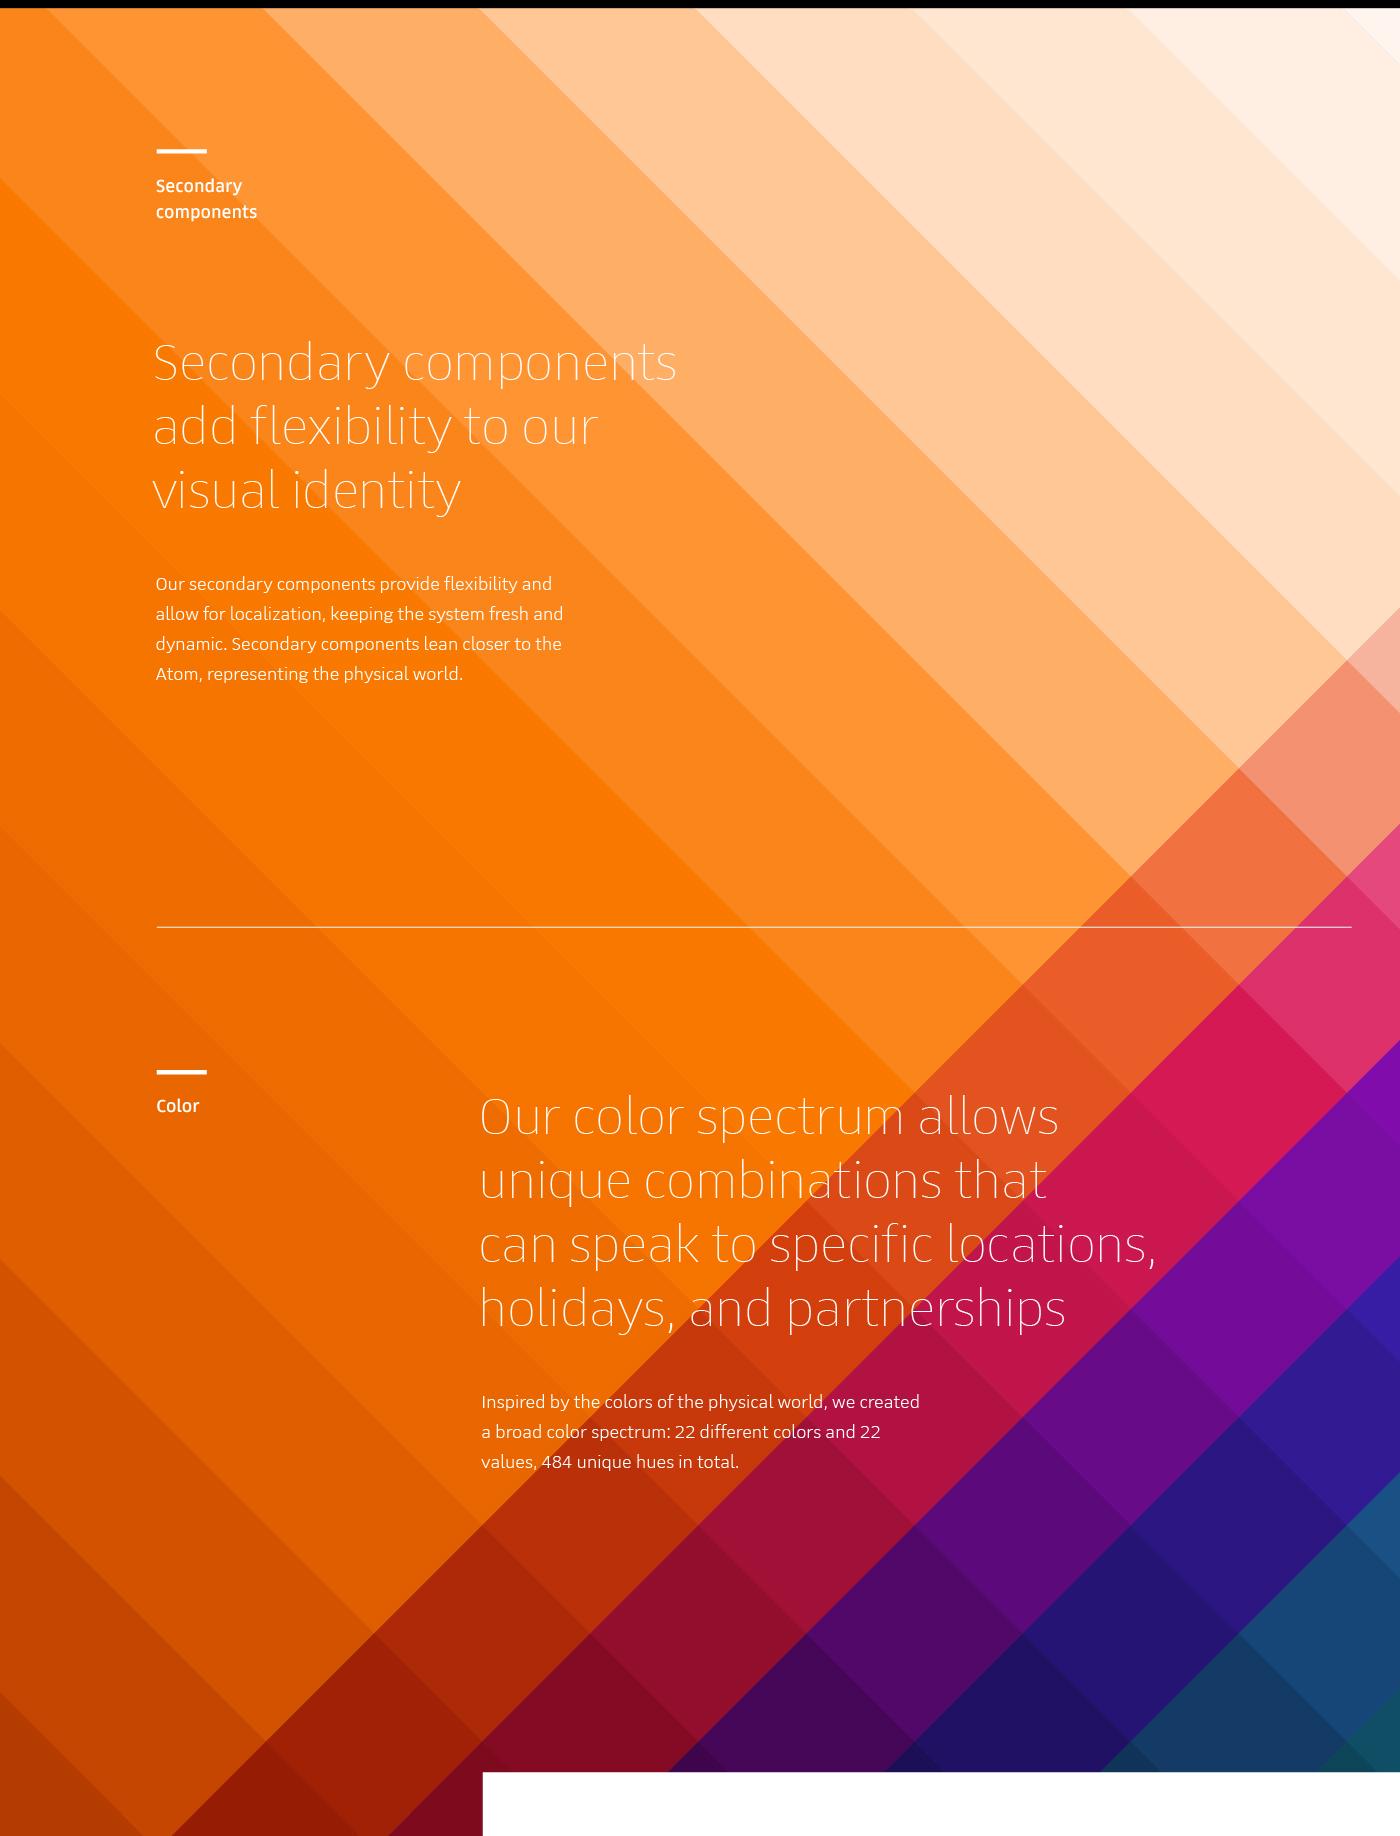 Uber visual identity visual Identity redesign redesign Design Framework branding